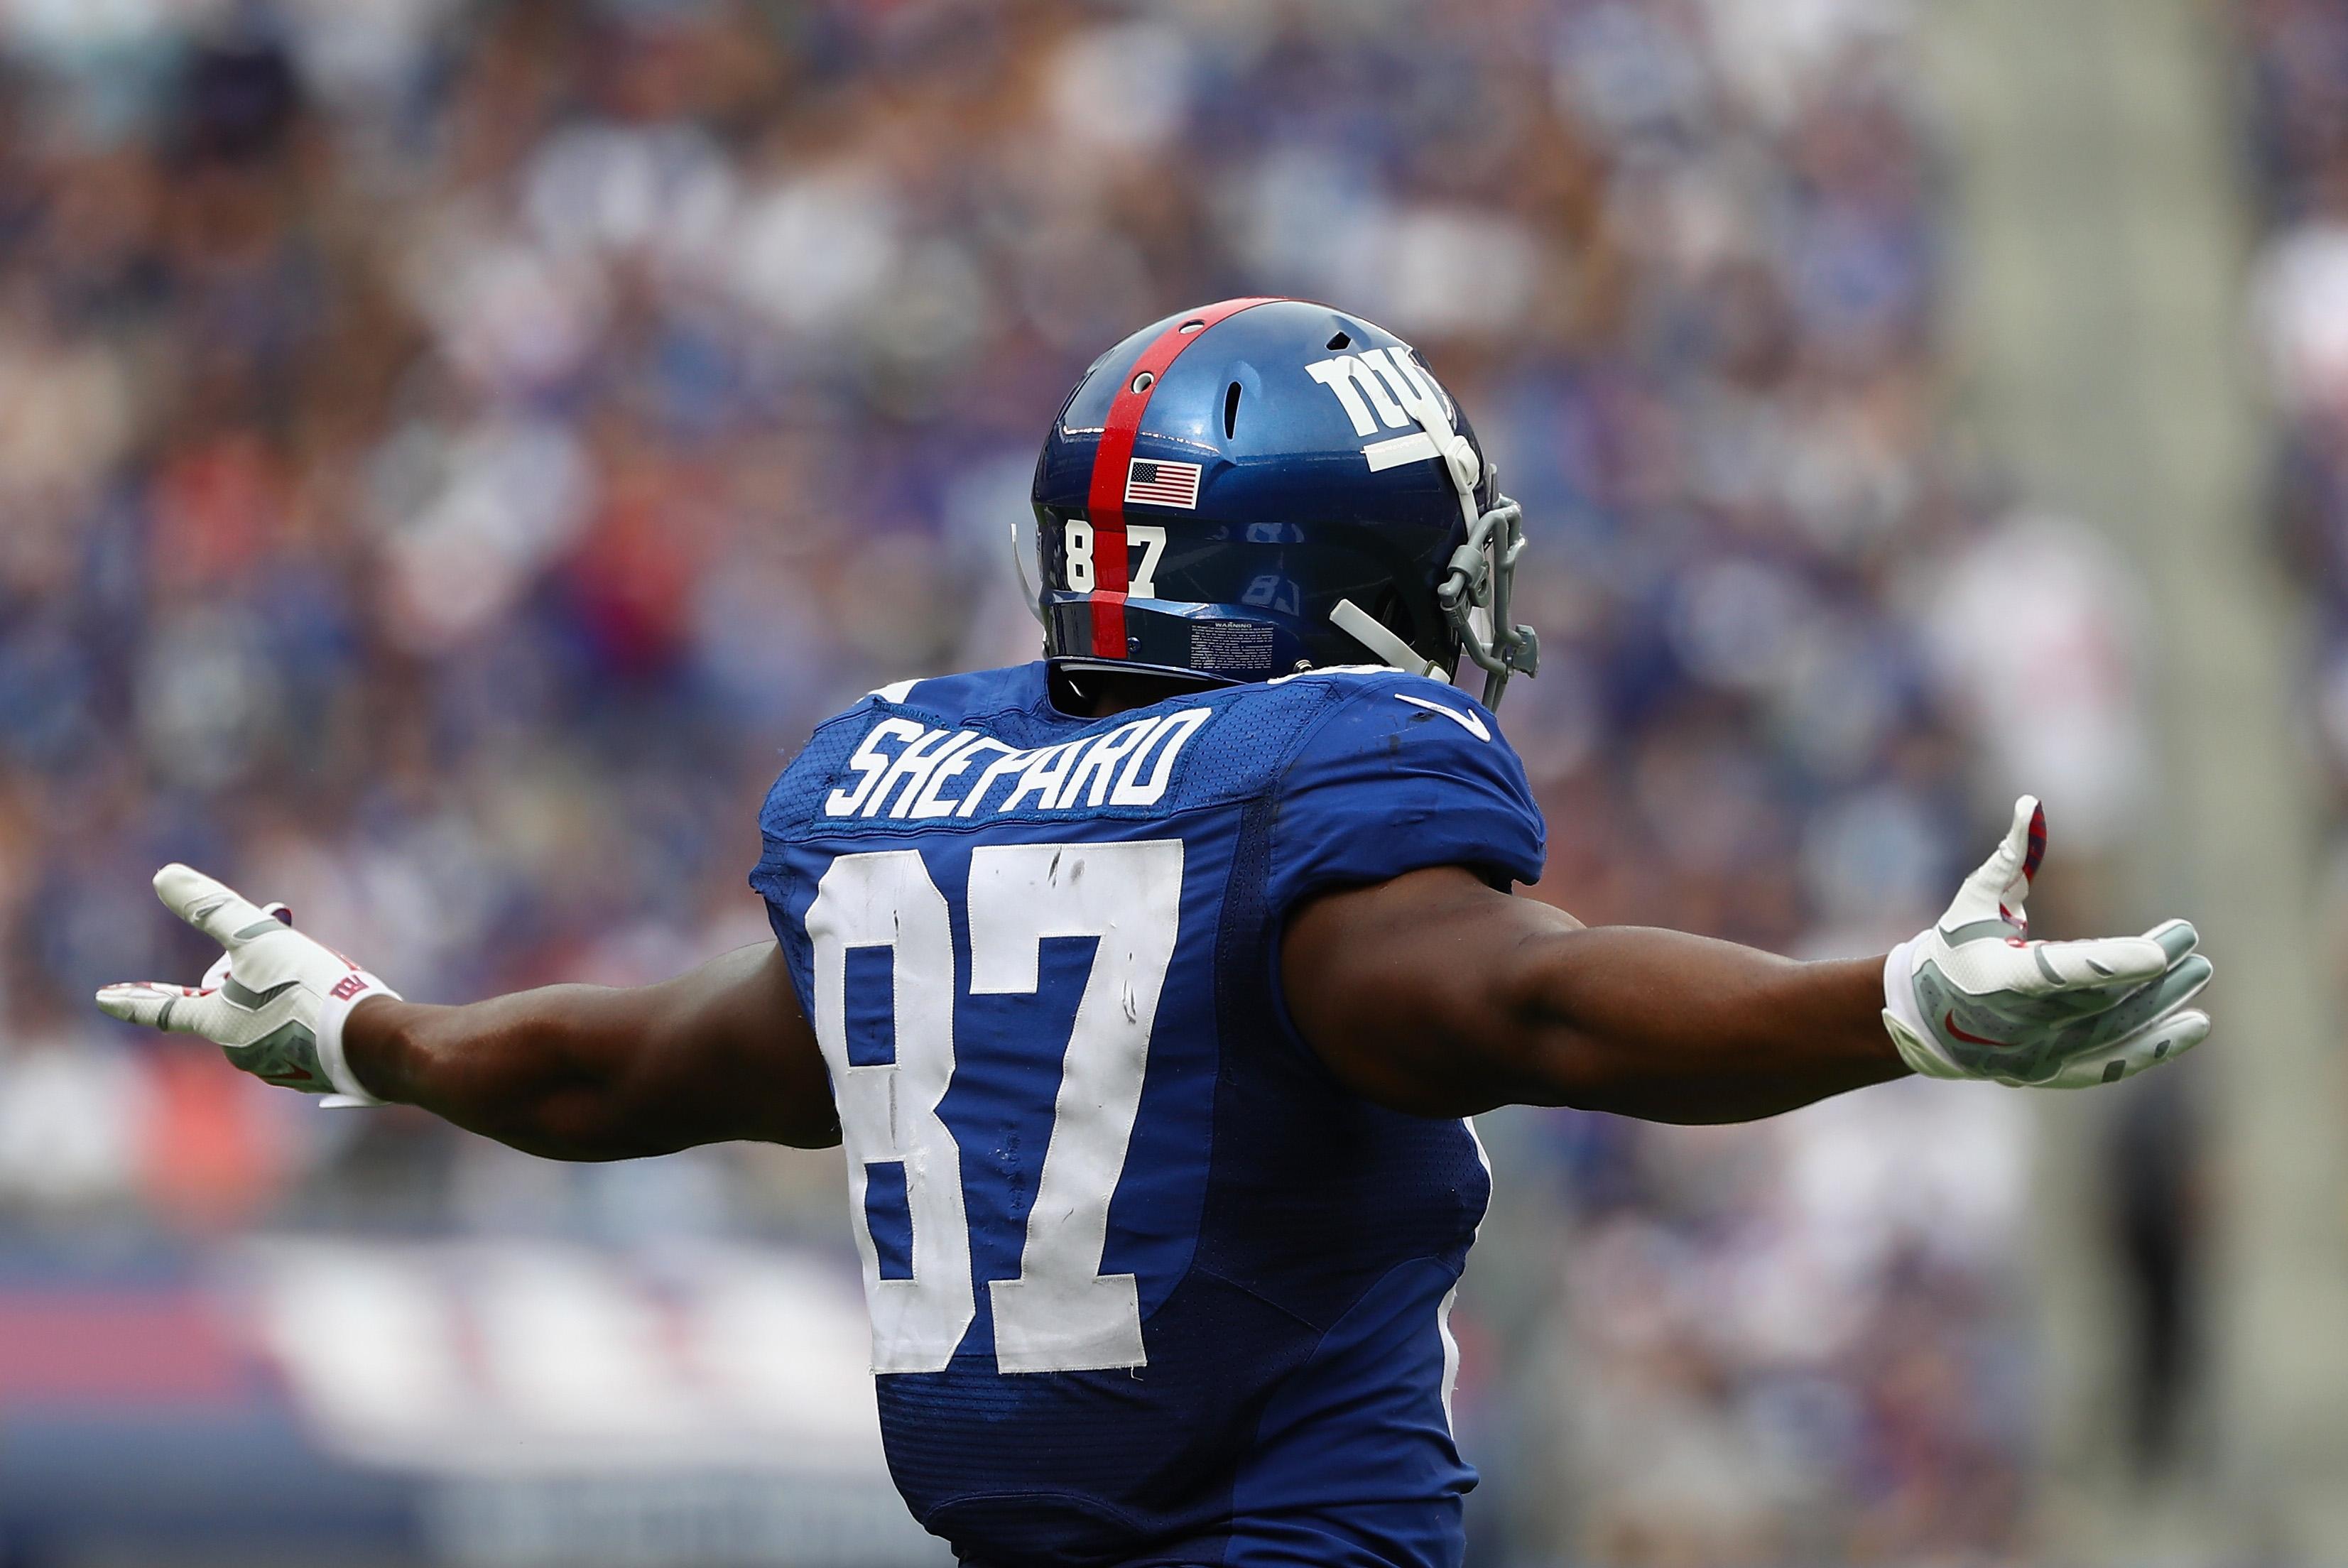 Ezekiel Elliott runs over Giants after stiff-arming Goodell